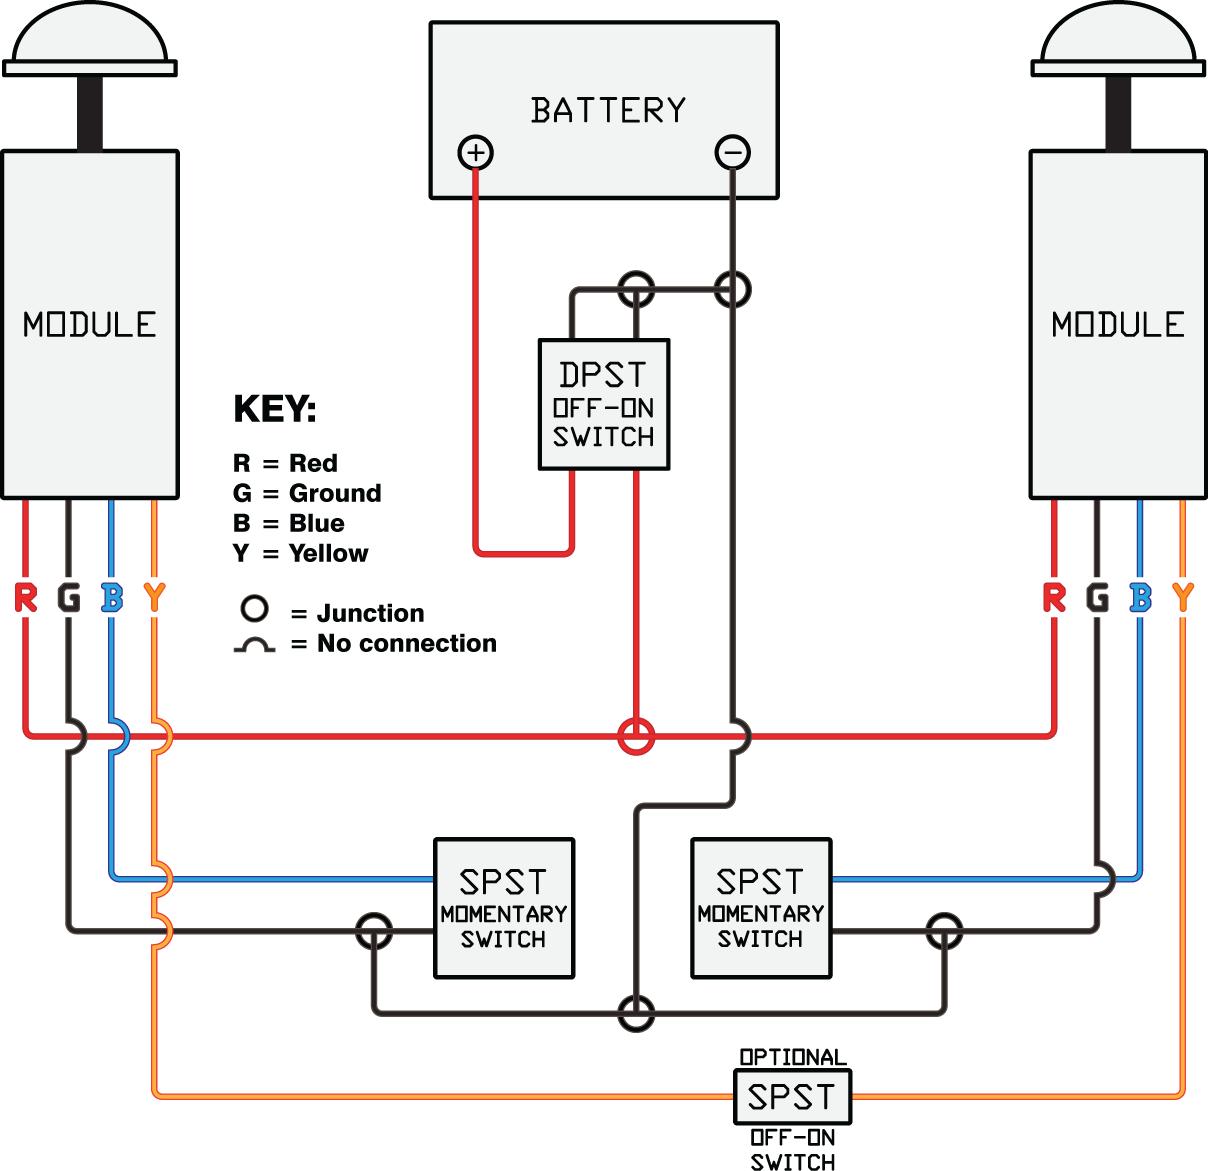 Kfi Winch Wiring Diagram : Kfi red led strobe light atv winch mounts and